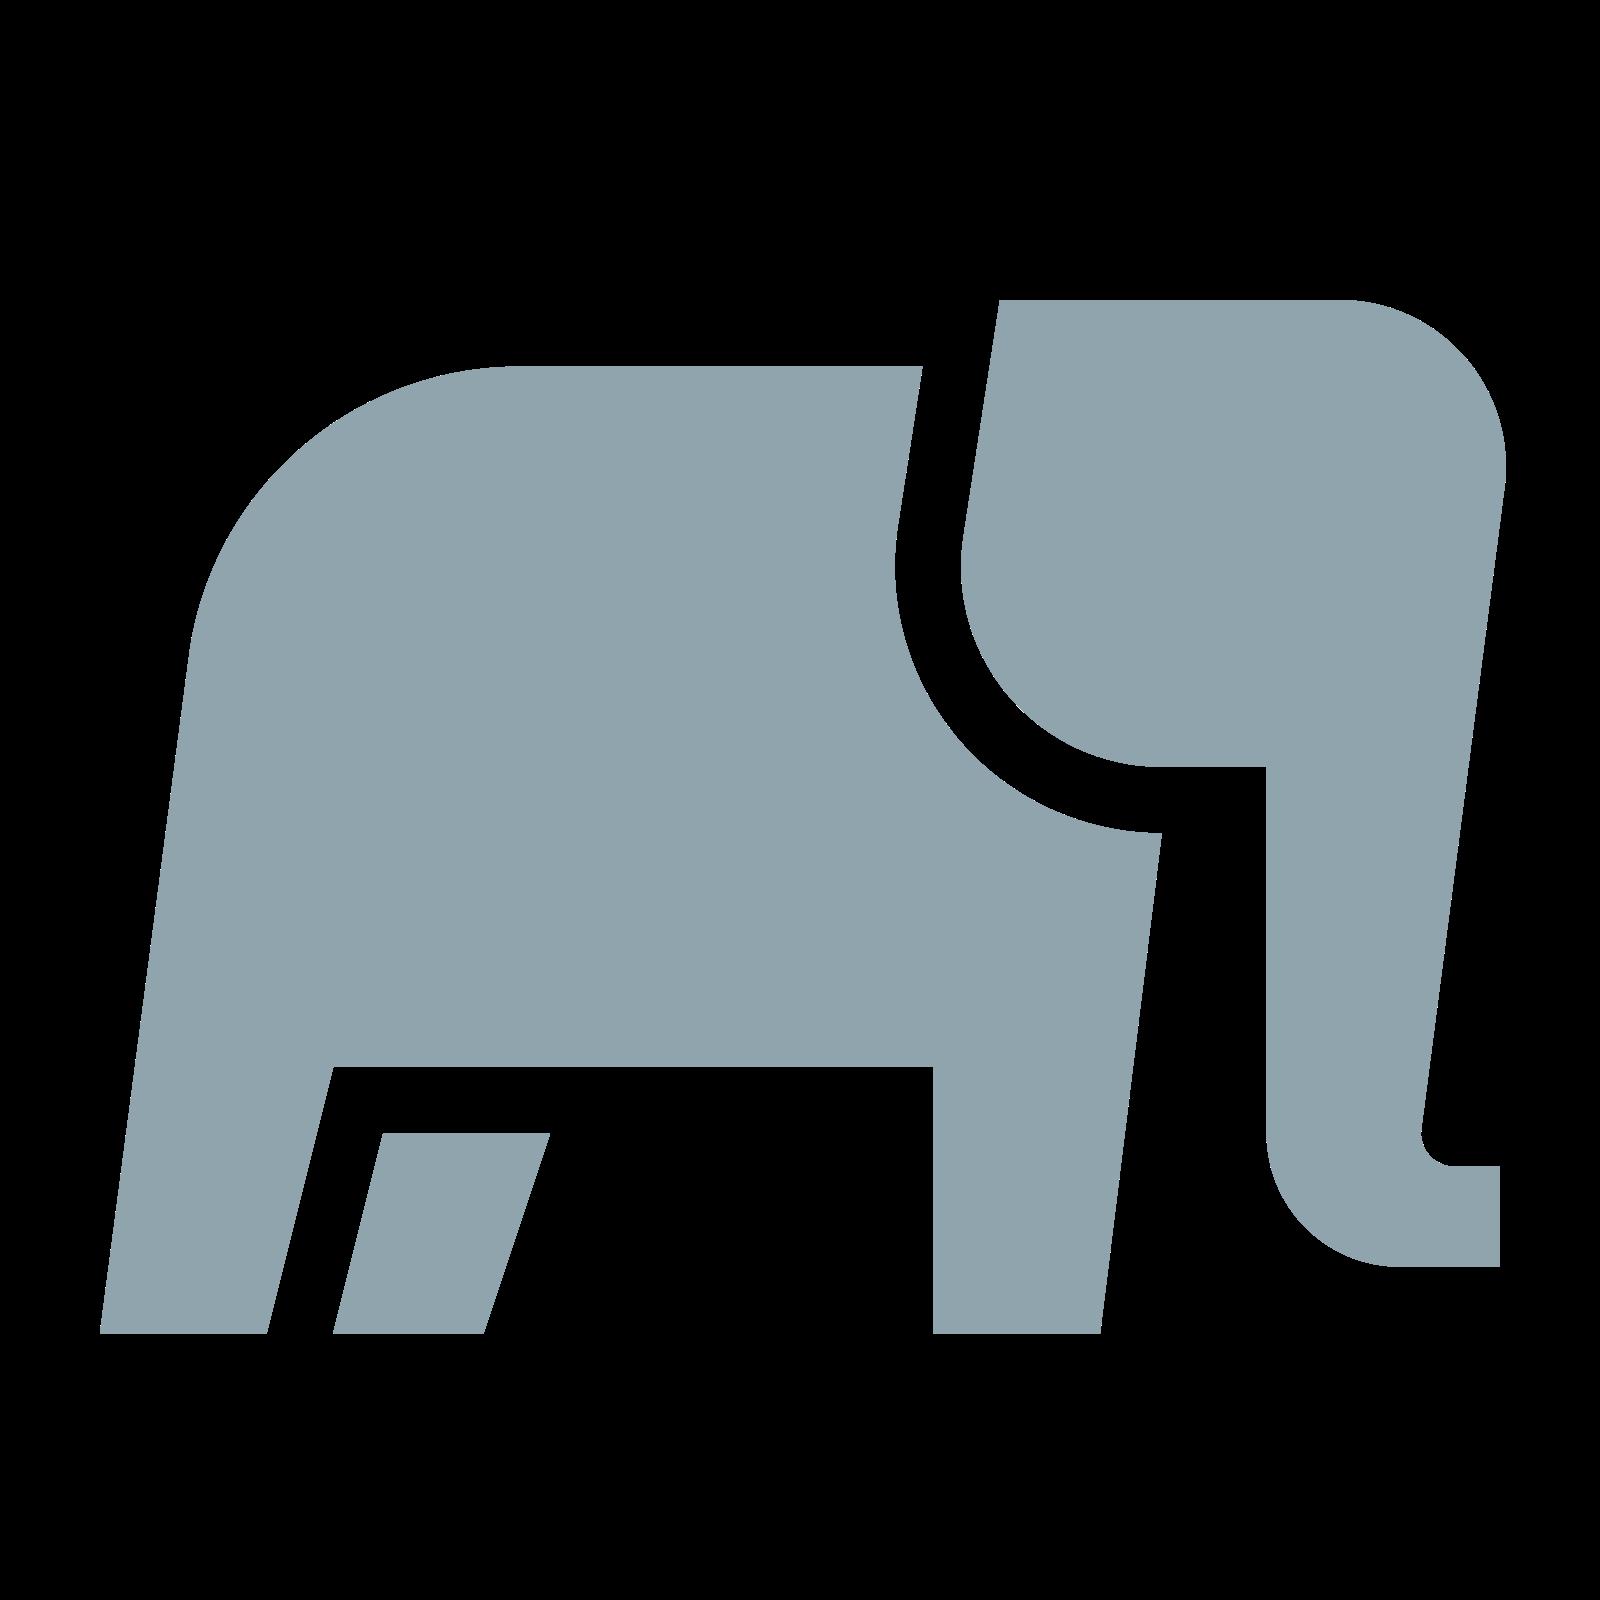 IA Financial Group icon